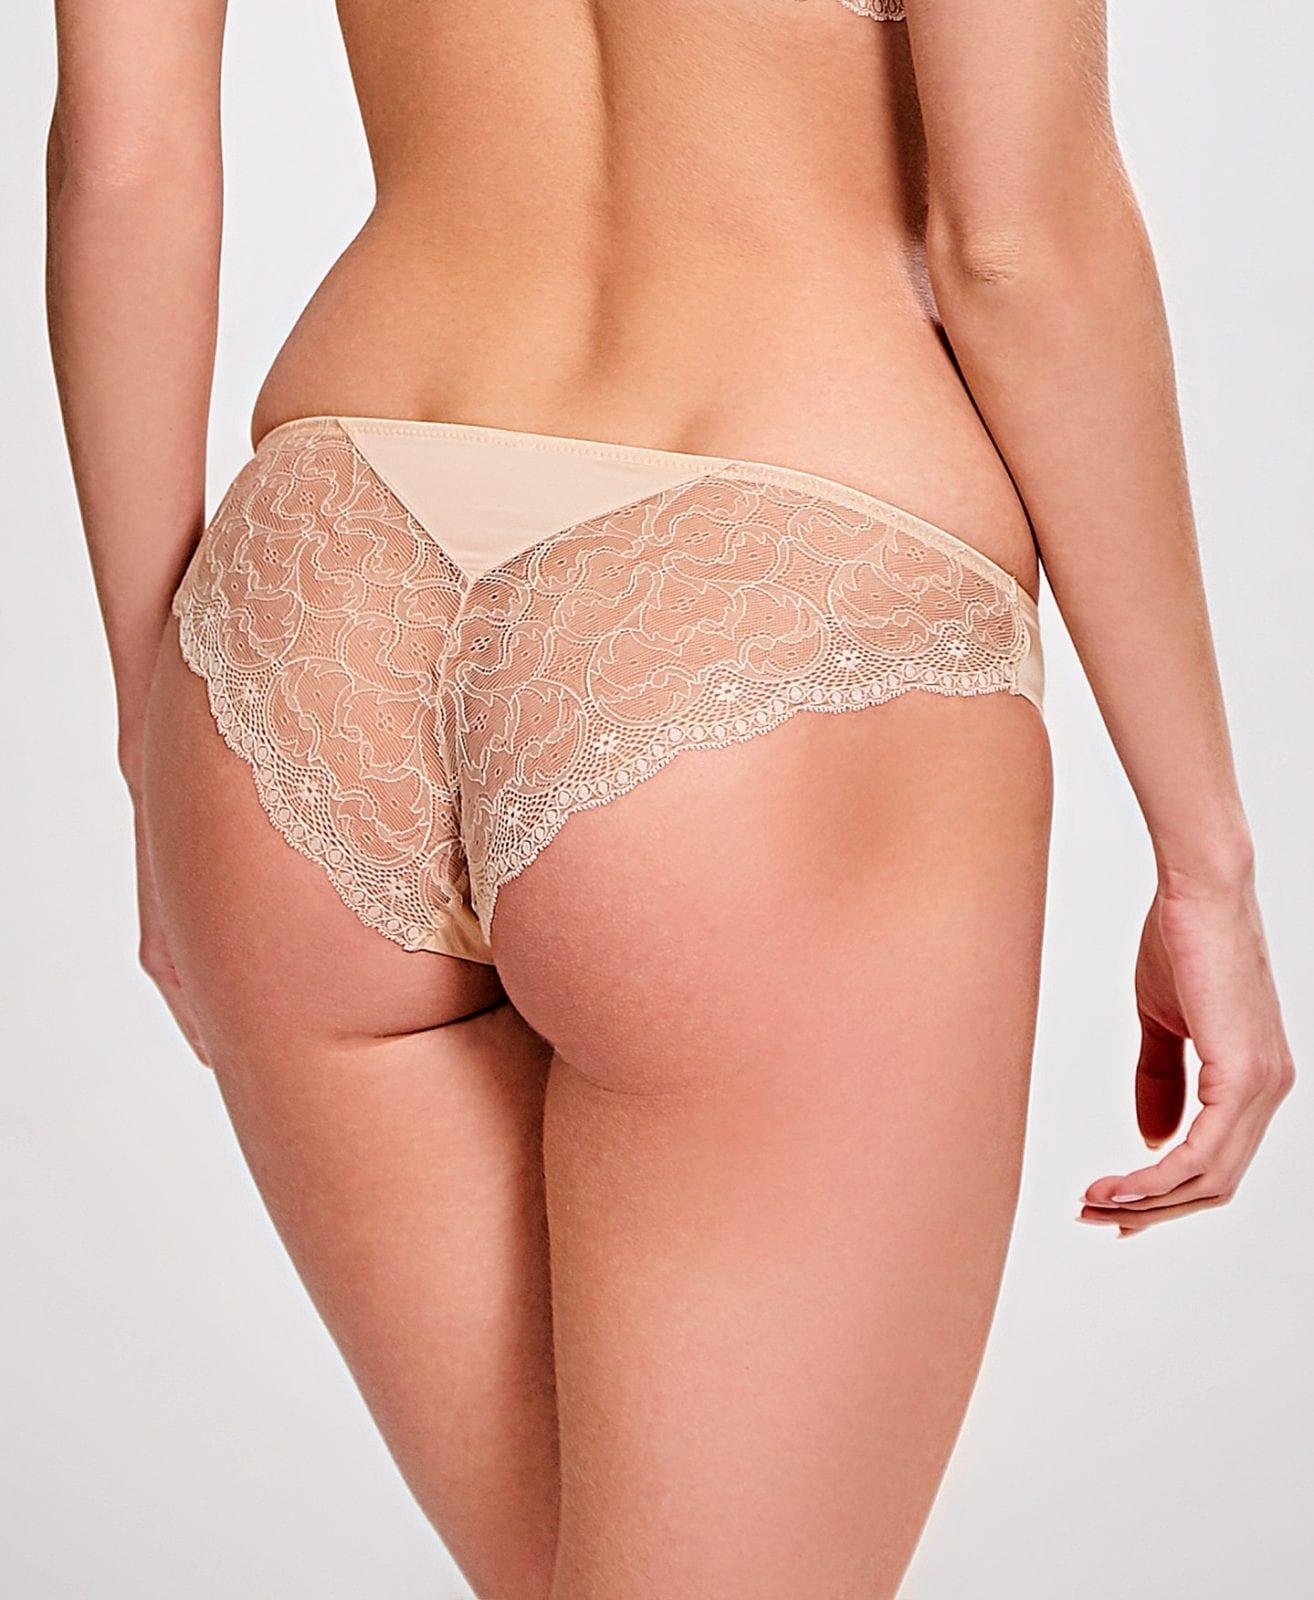 Бразильяно 7951_208_Ardour Sweetheart Bra Nude Back Trade 4 — копия